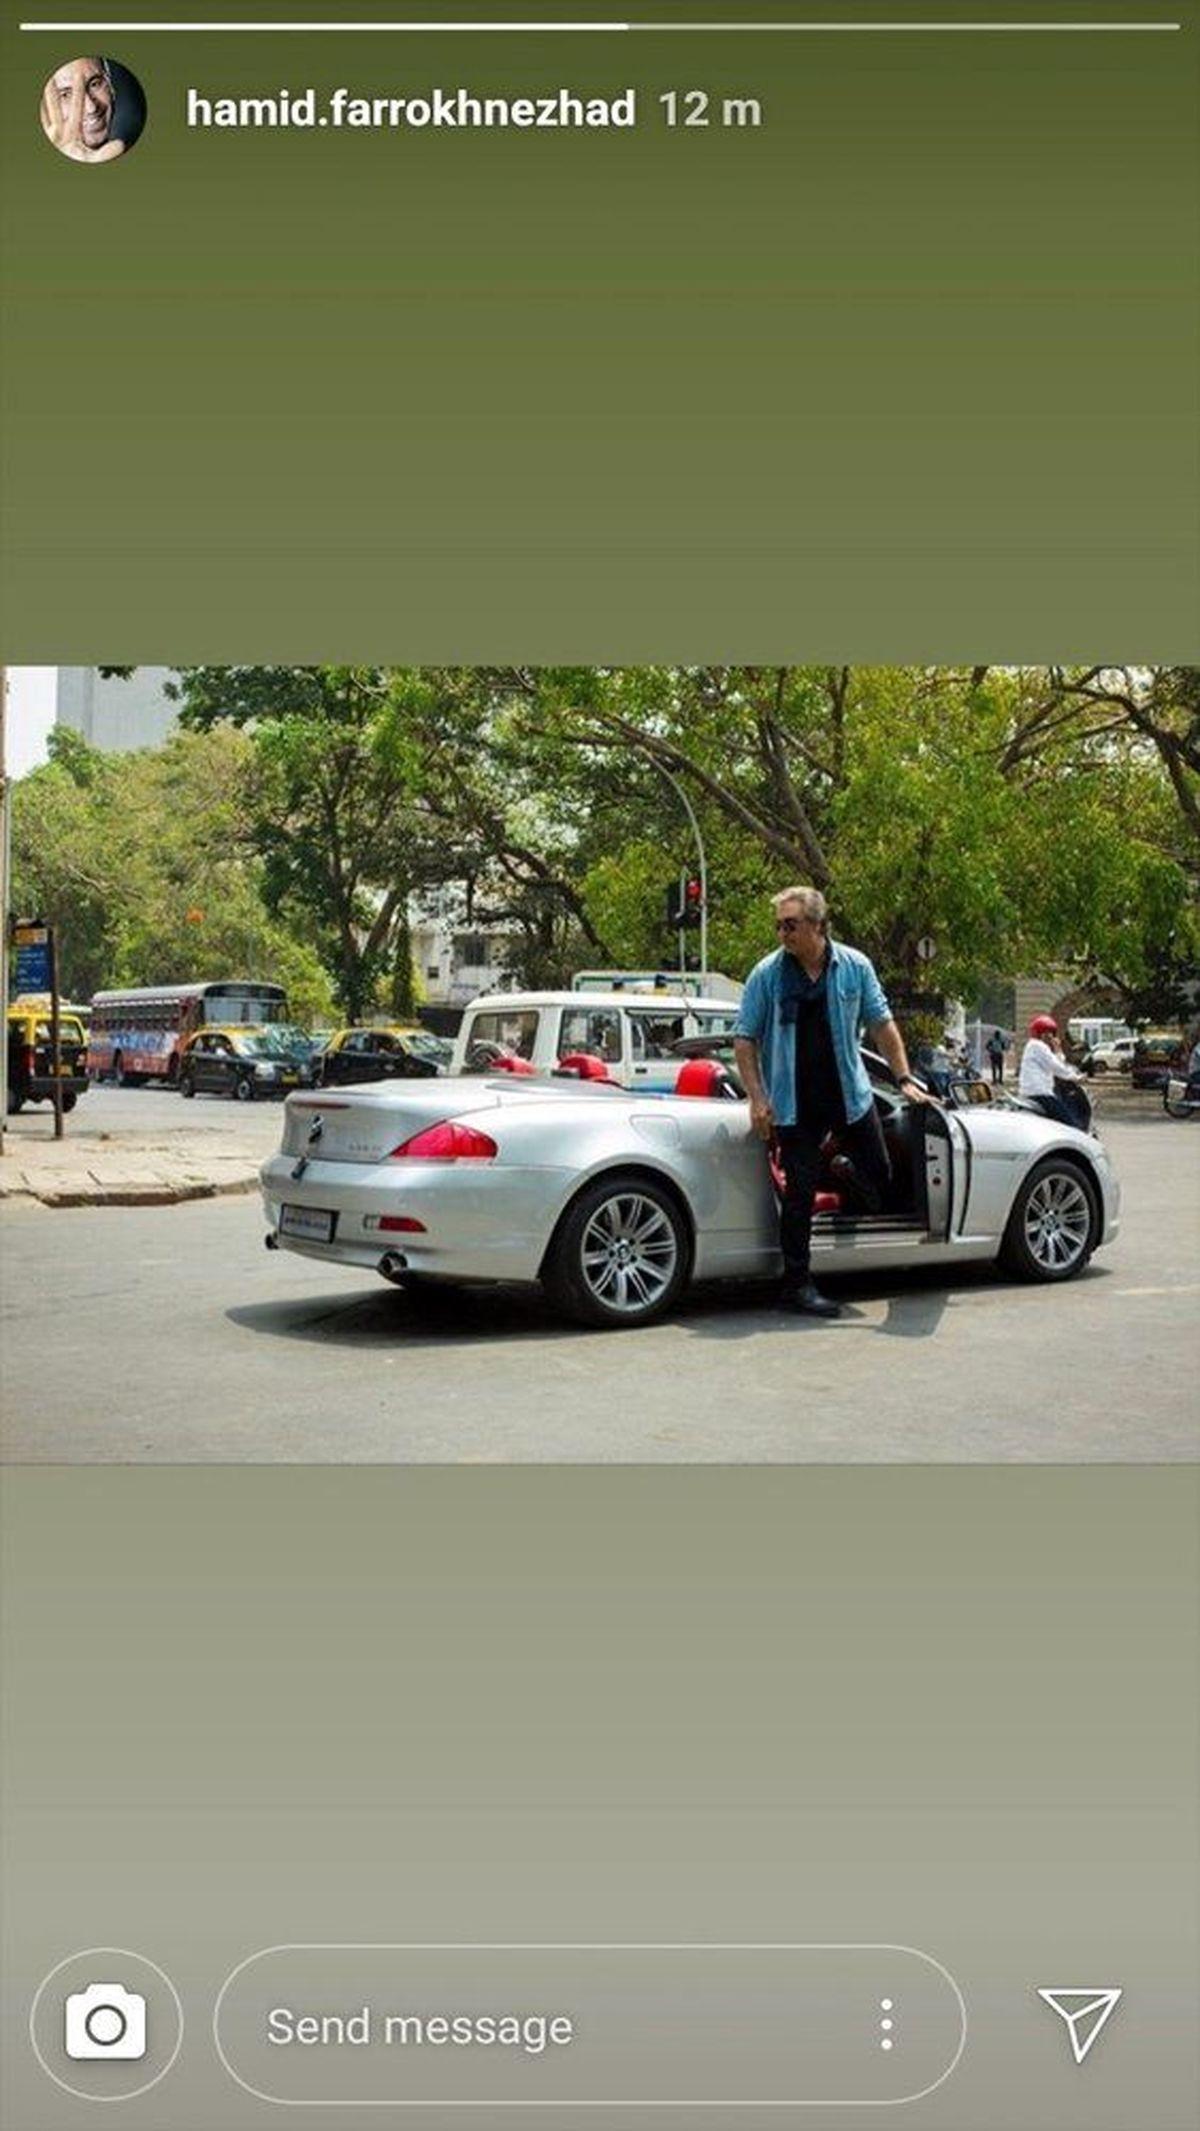 تیپ و ماشین لوکس حمید فرخ نژاد